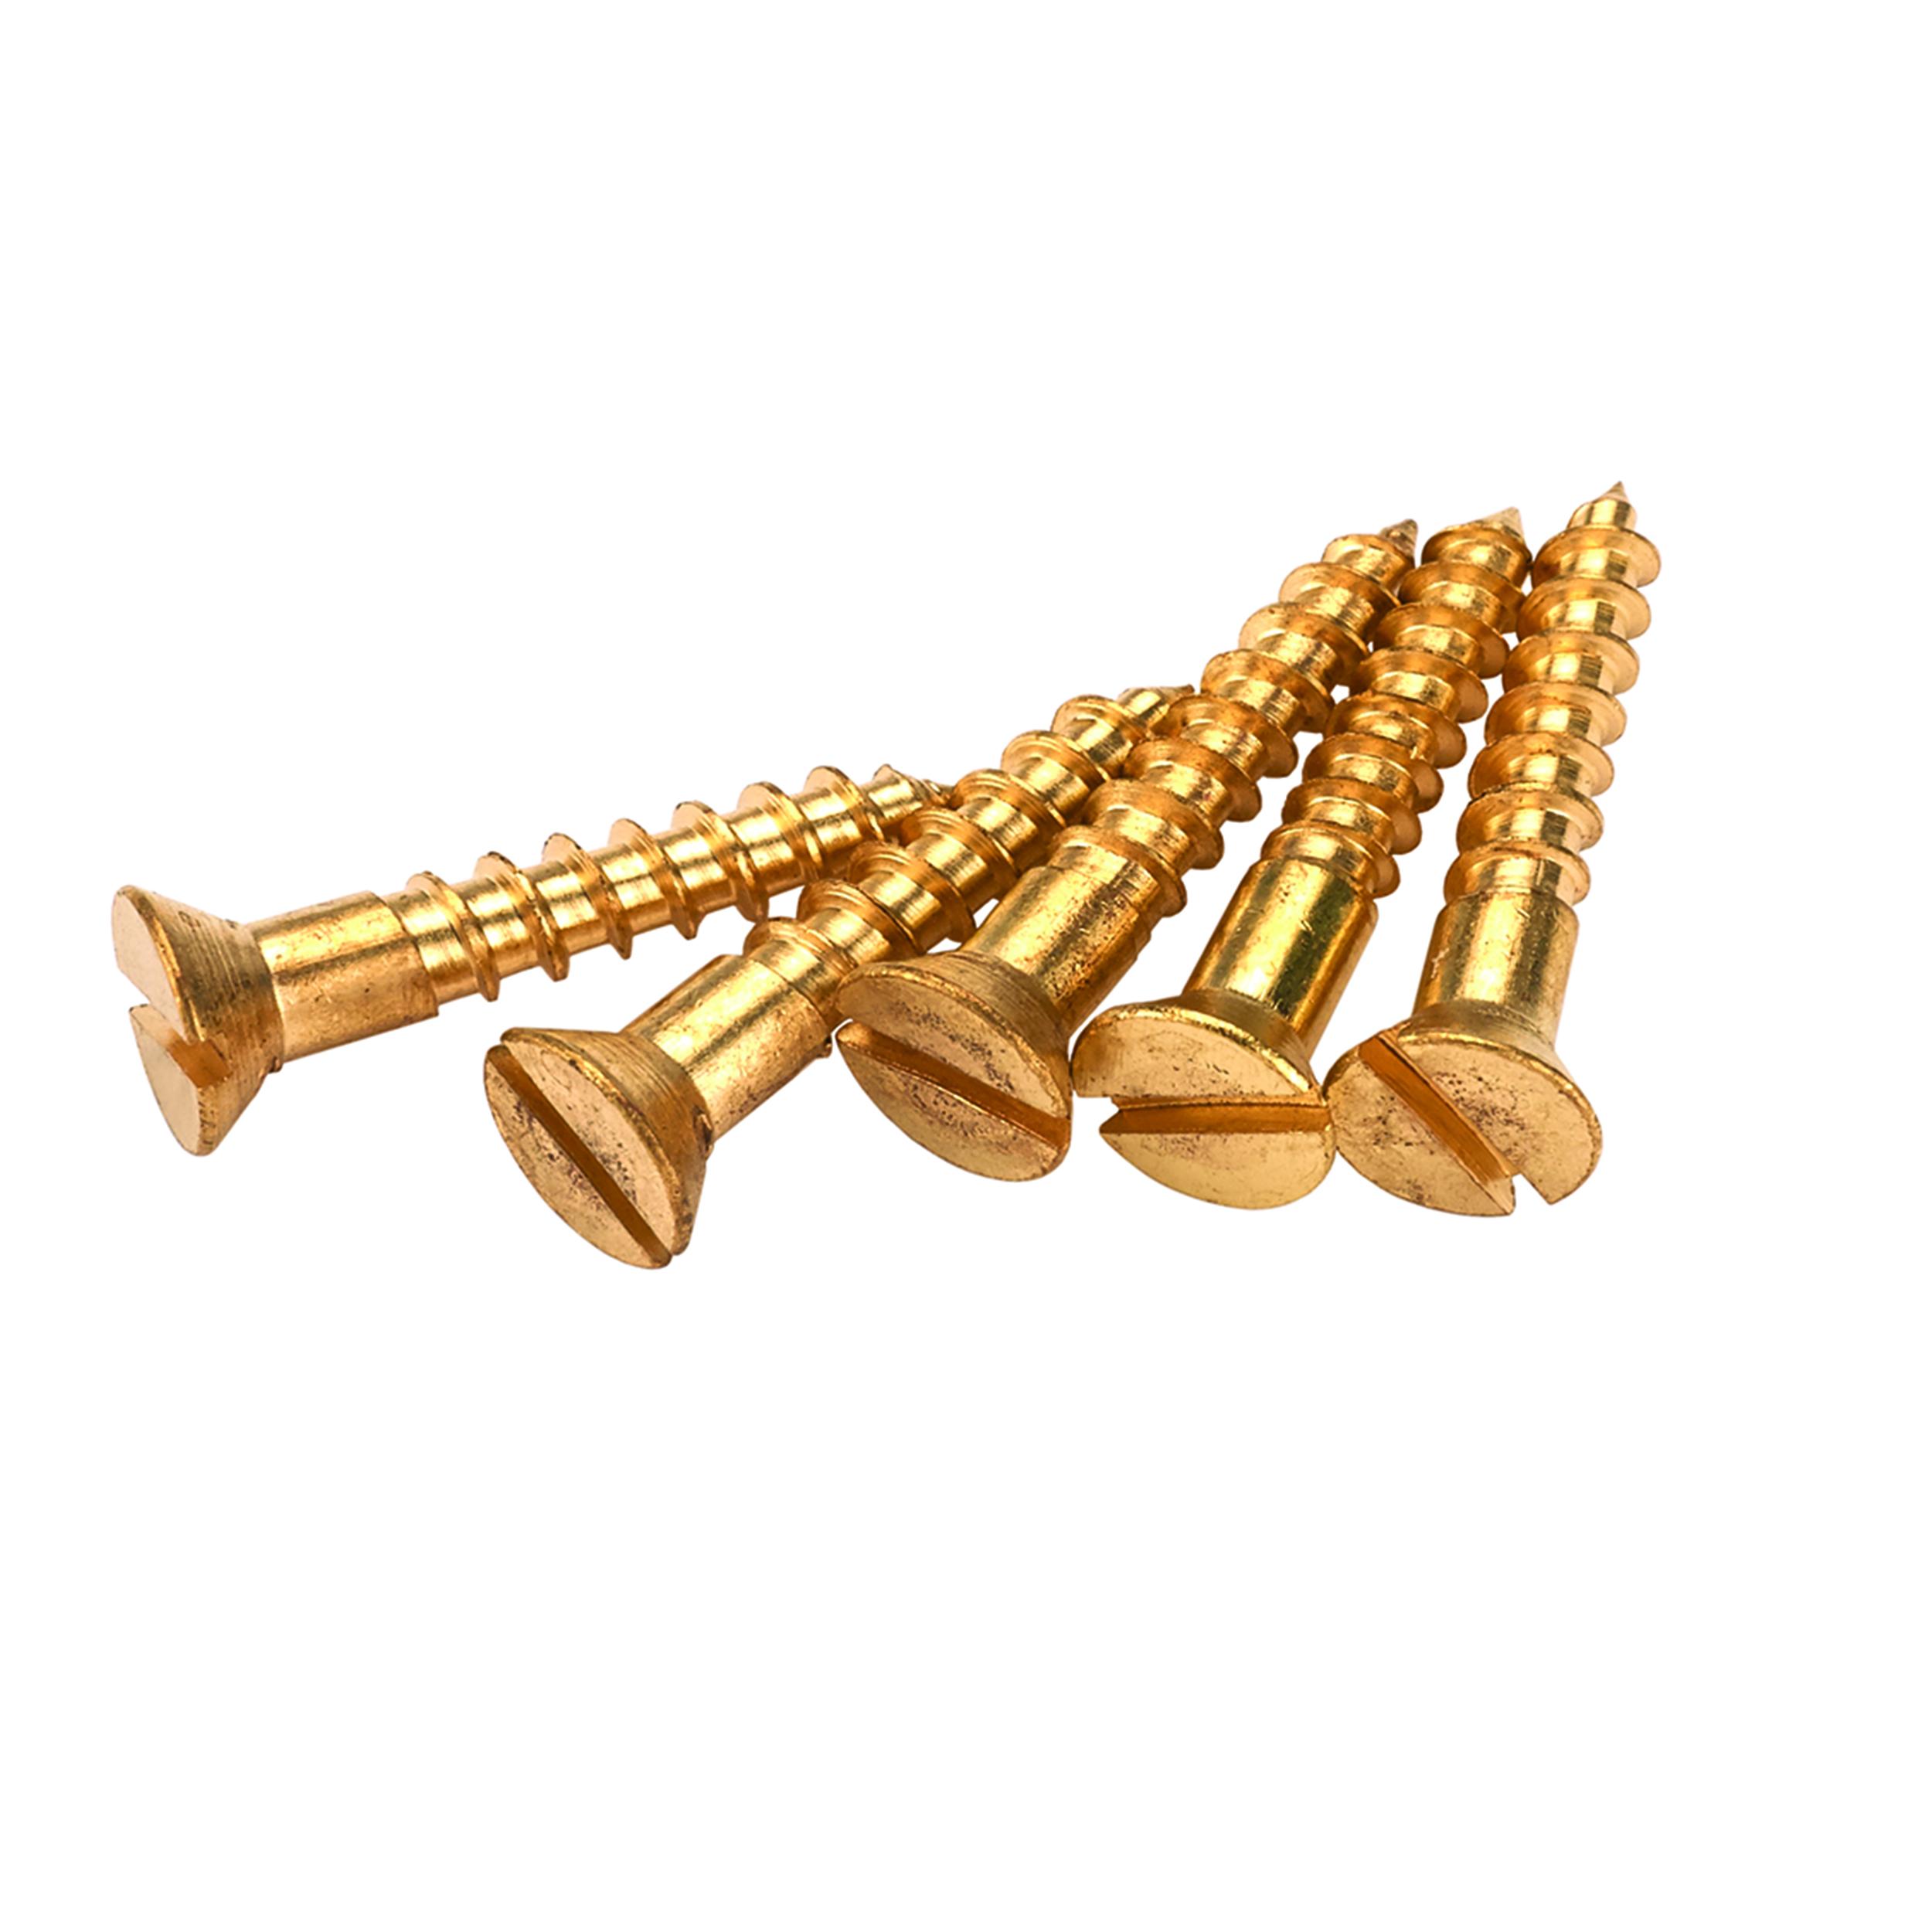 Solid Brass Screws #1 x 1/2